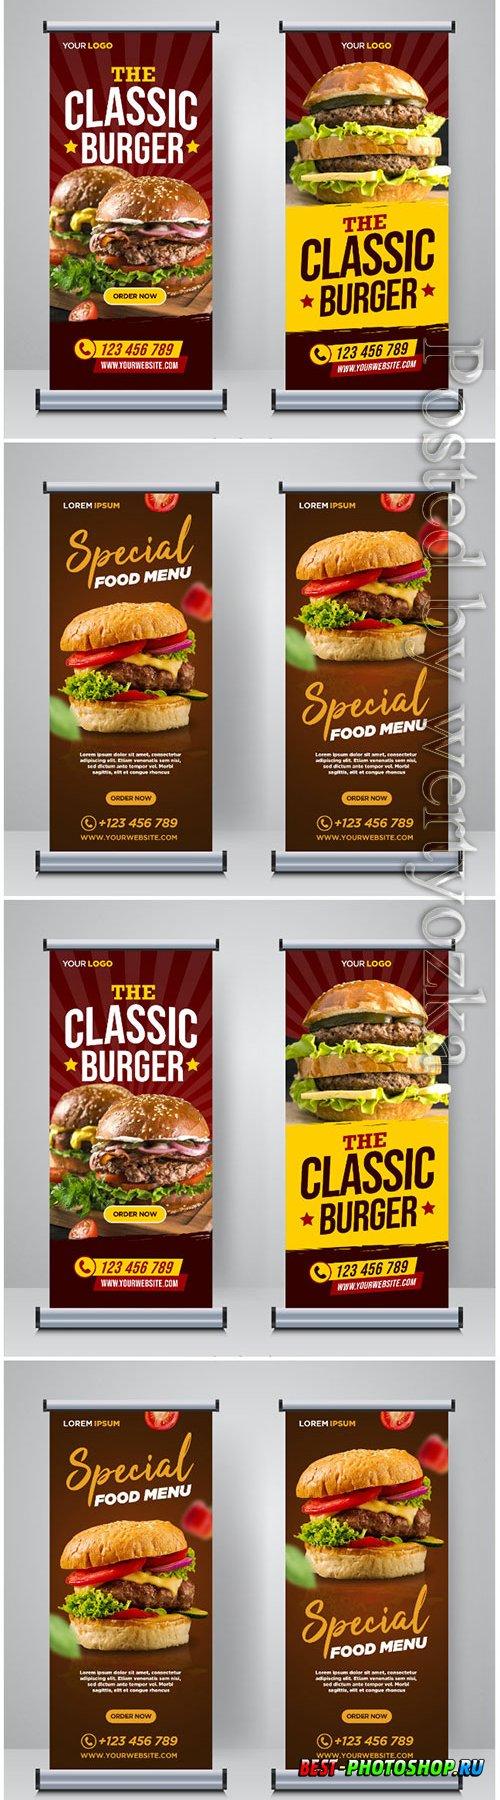 Restaurant food social media banner post design template vector